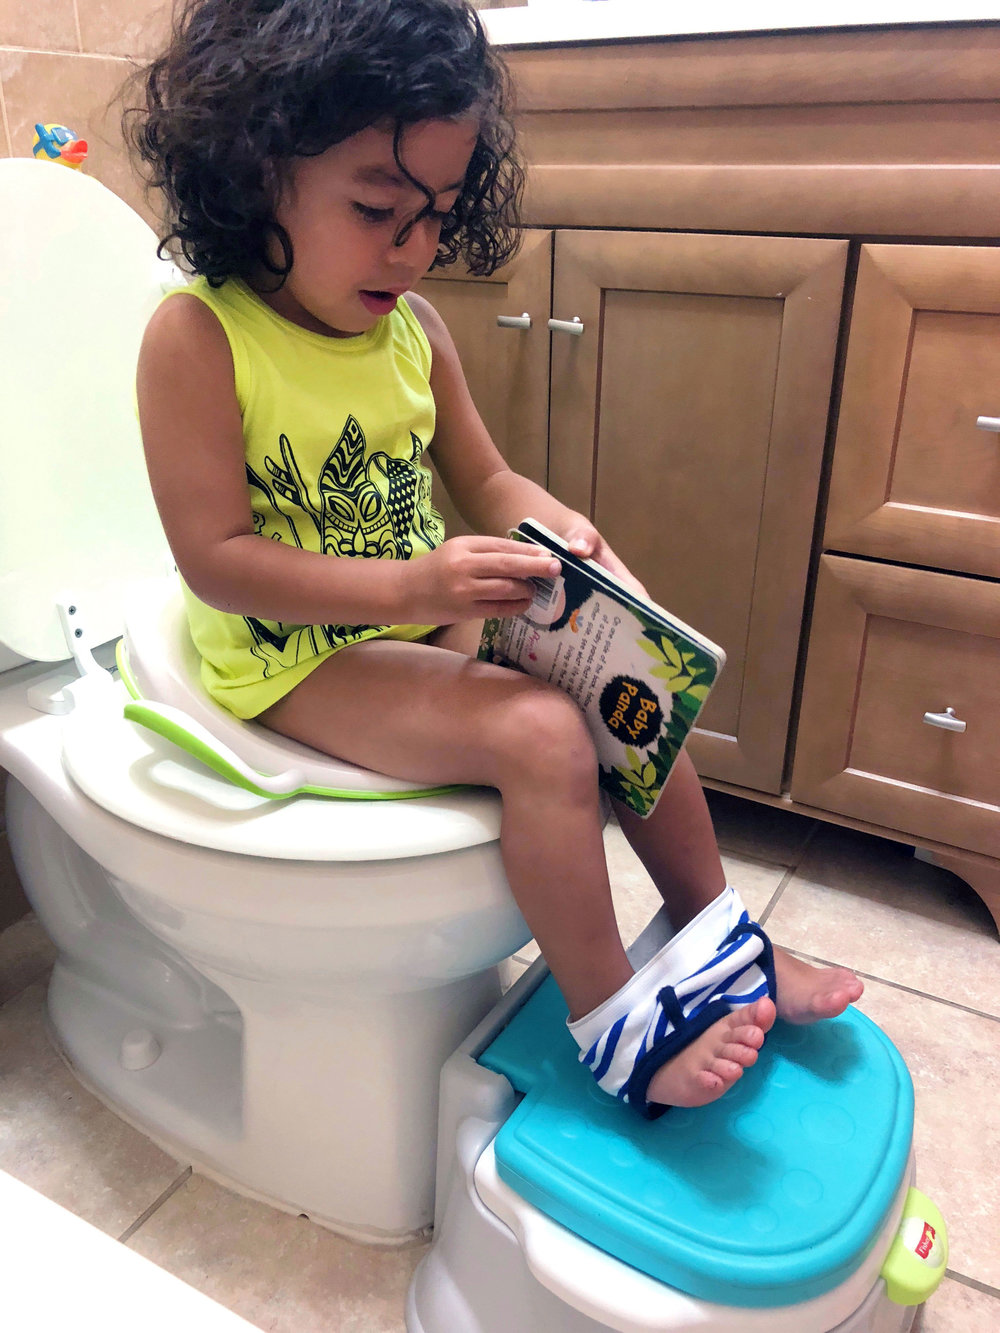 Toddler Potty Training | Potty Training | How To Potty Train Toddler 3 Days | How to Potty Train | #pottytrain | #howtopottytrain | #pottytrainingtips | #pottytraining | www.anajacqueline.com